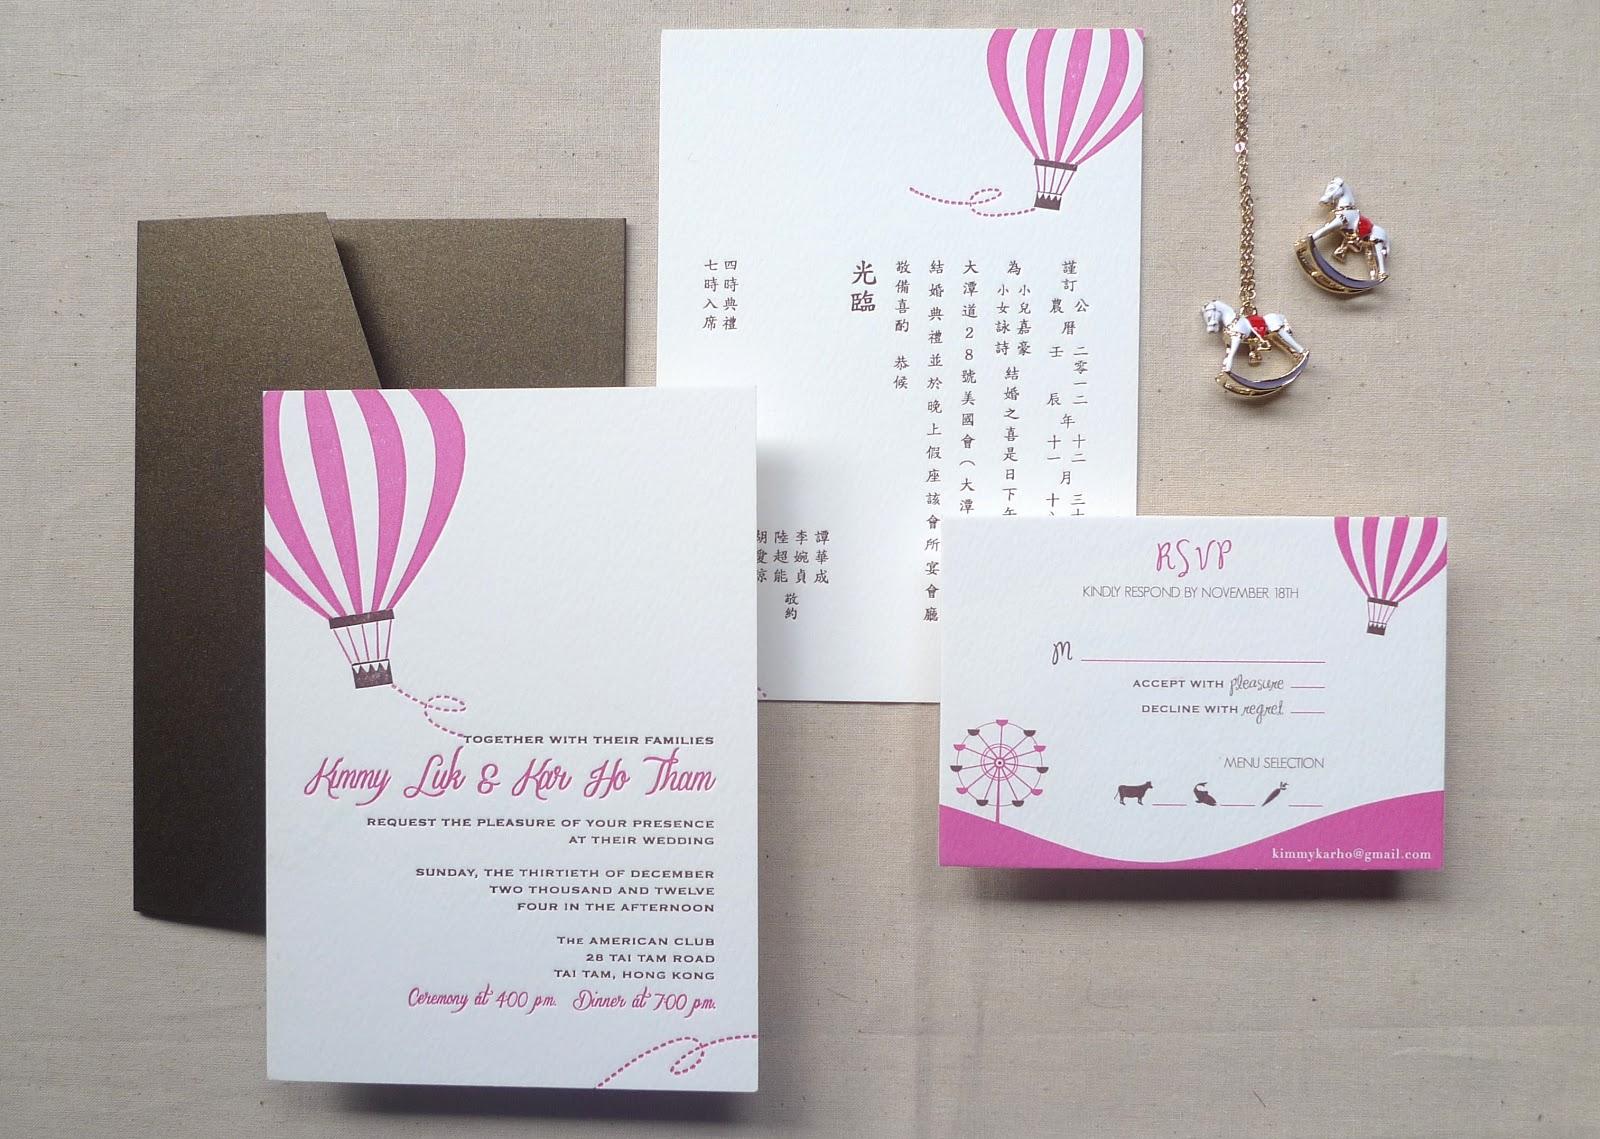 Kalo Make Art Bespoke Wedding Invitation Designs Fly with Us